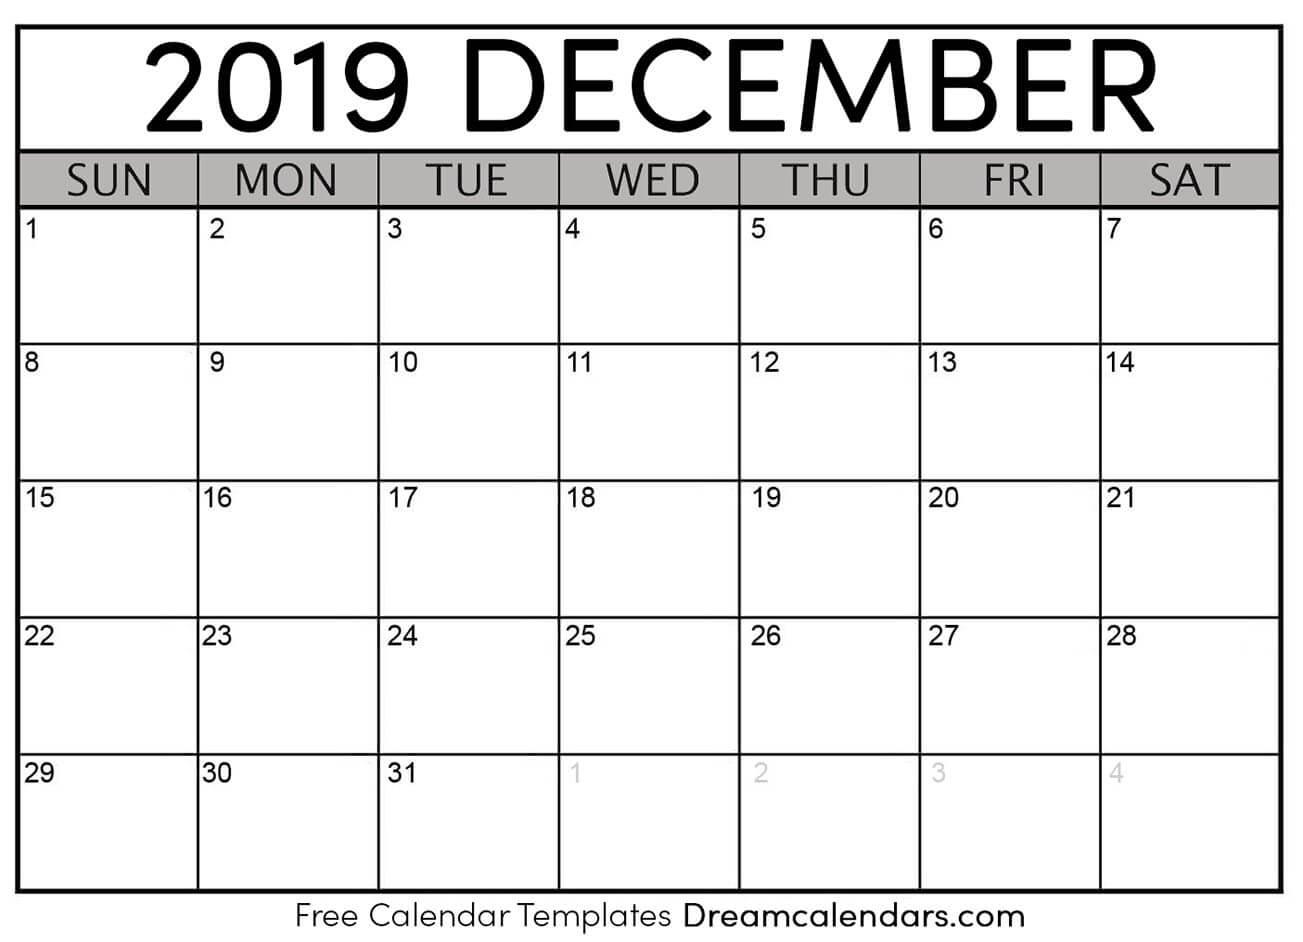 Printable December 2019 Calendar | Apache Openoffice Templates